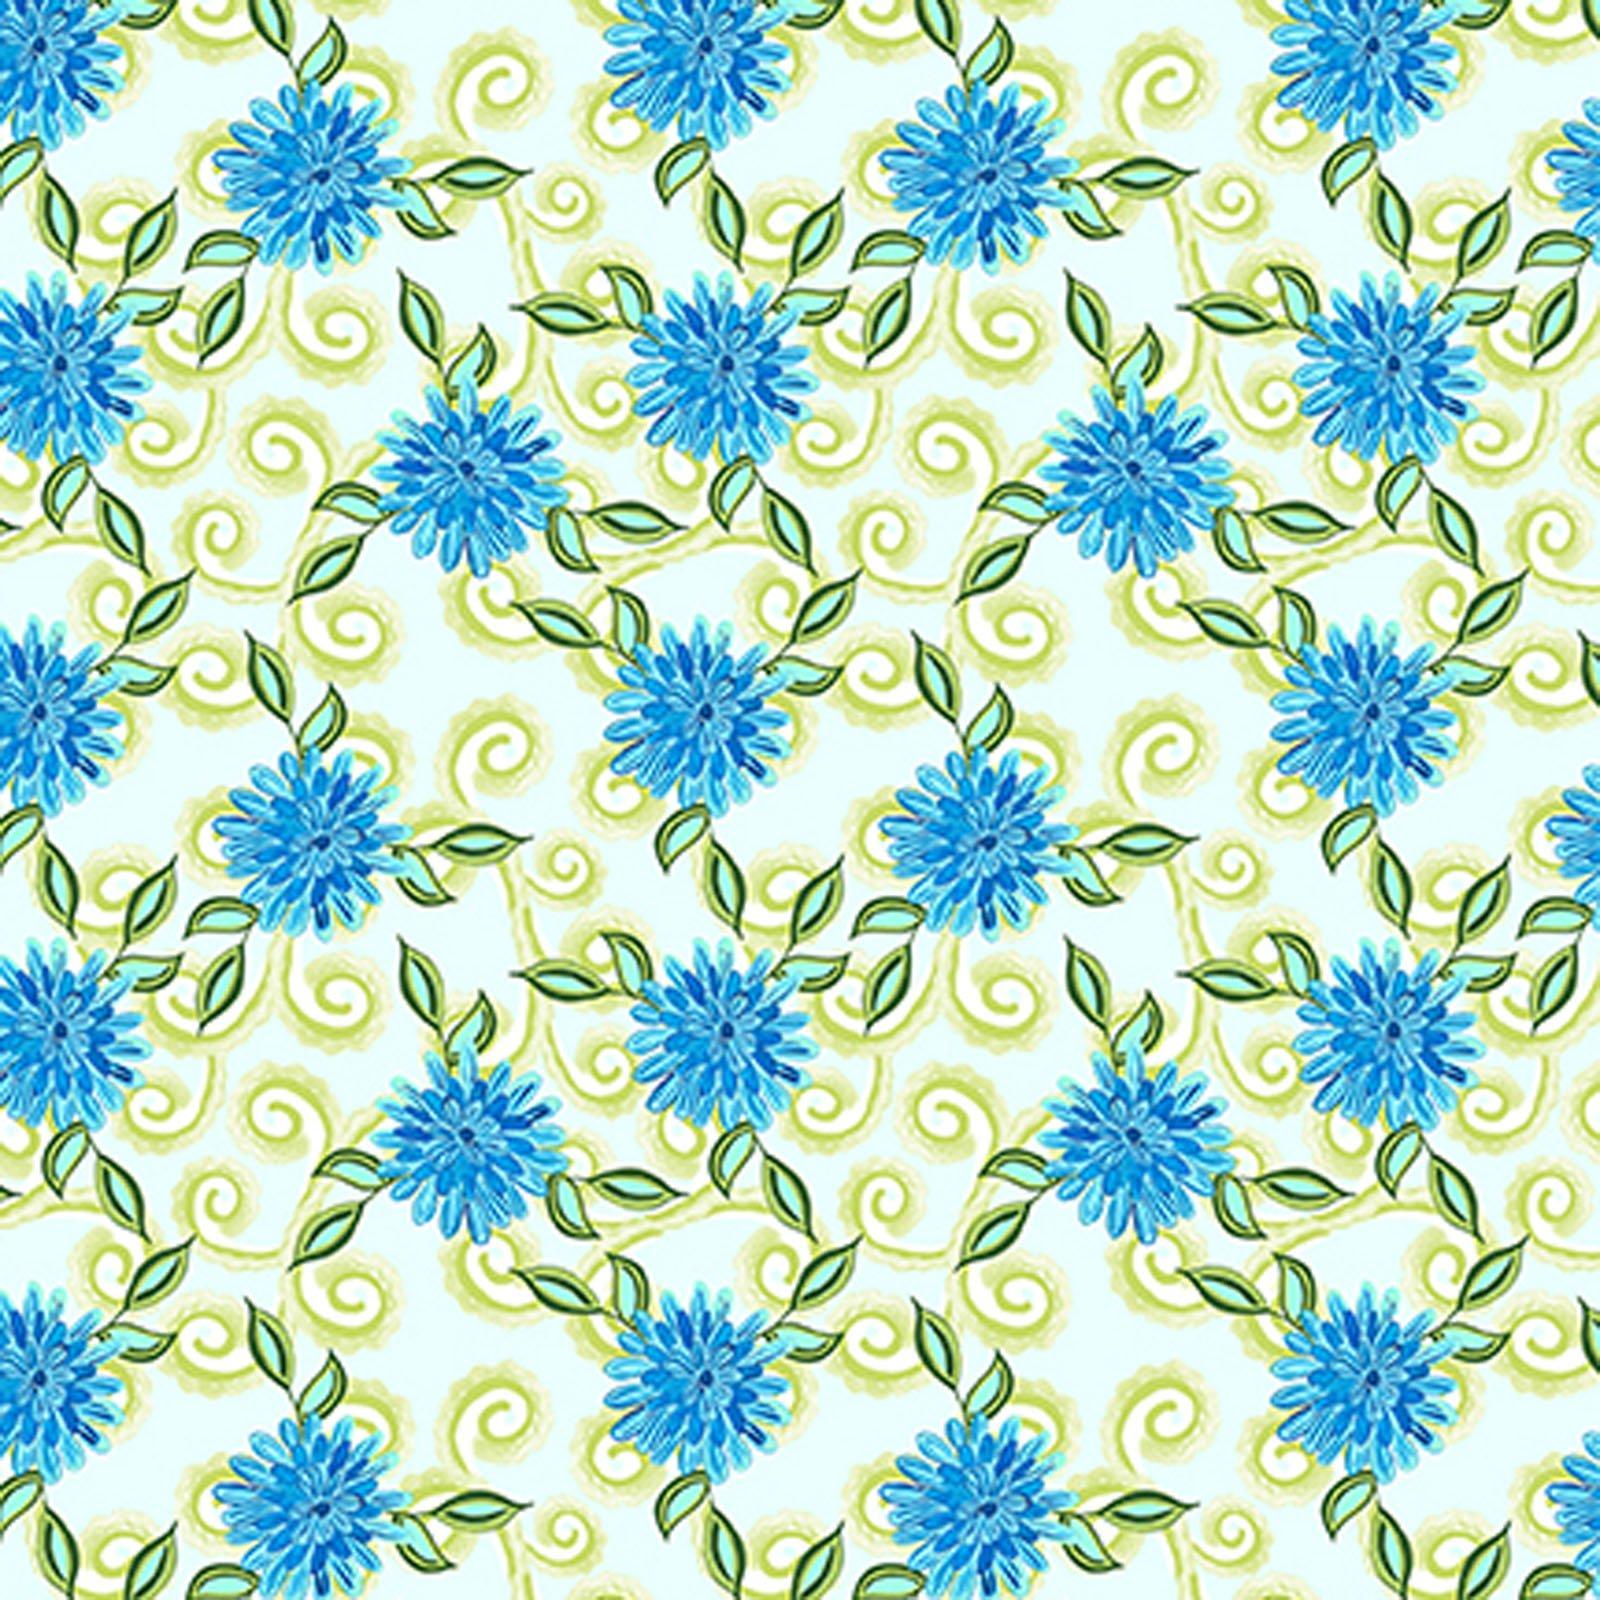 INTH-9JHR 1 - PETIT JARDIN BY JENNIFER HEYNEN MARIGOLD BLUE